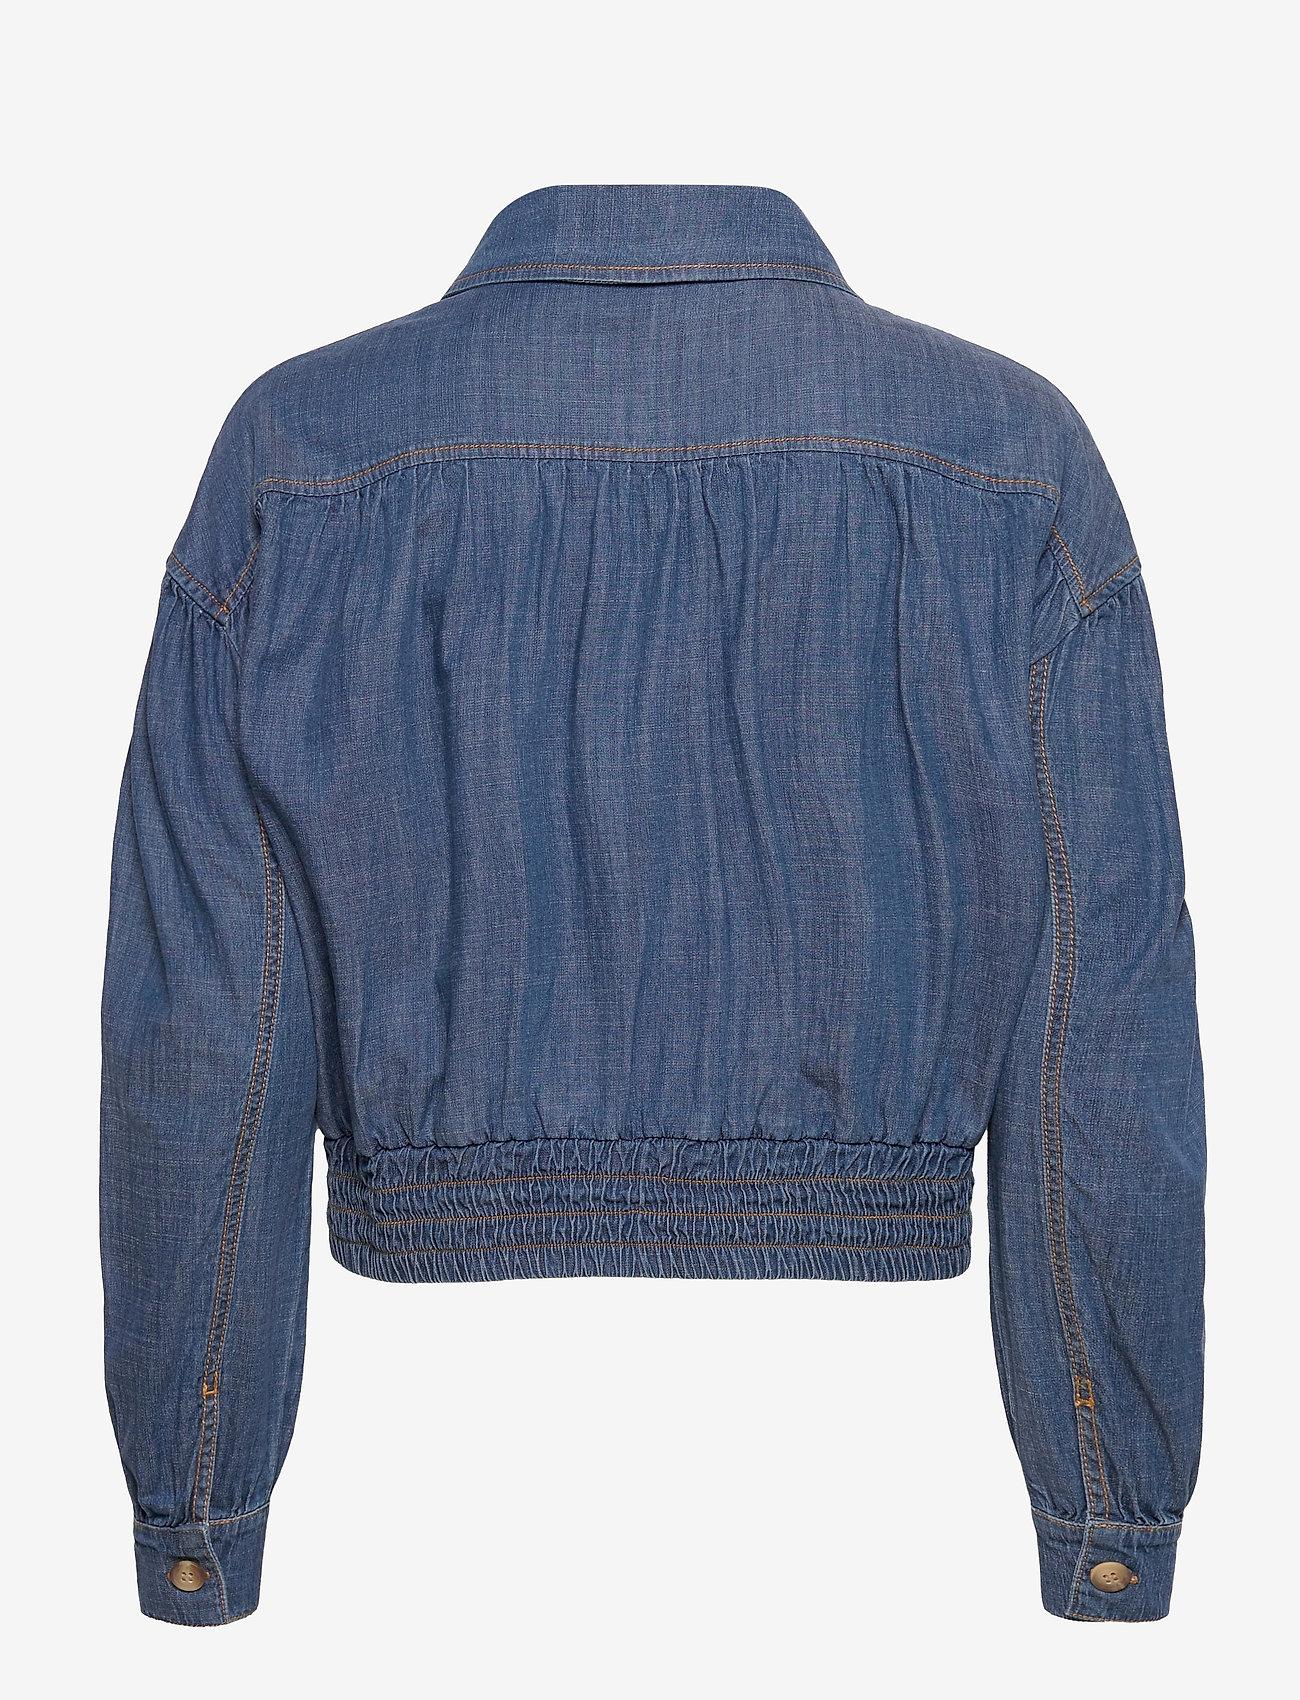 SAND - R/Denim - Margot - blouses met lange mouwen - blue - 1